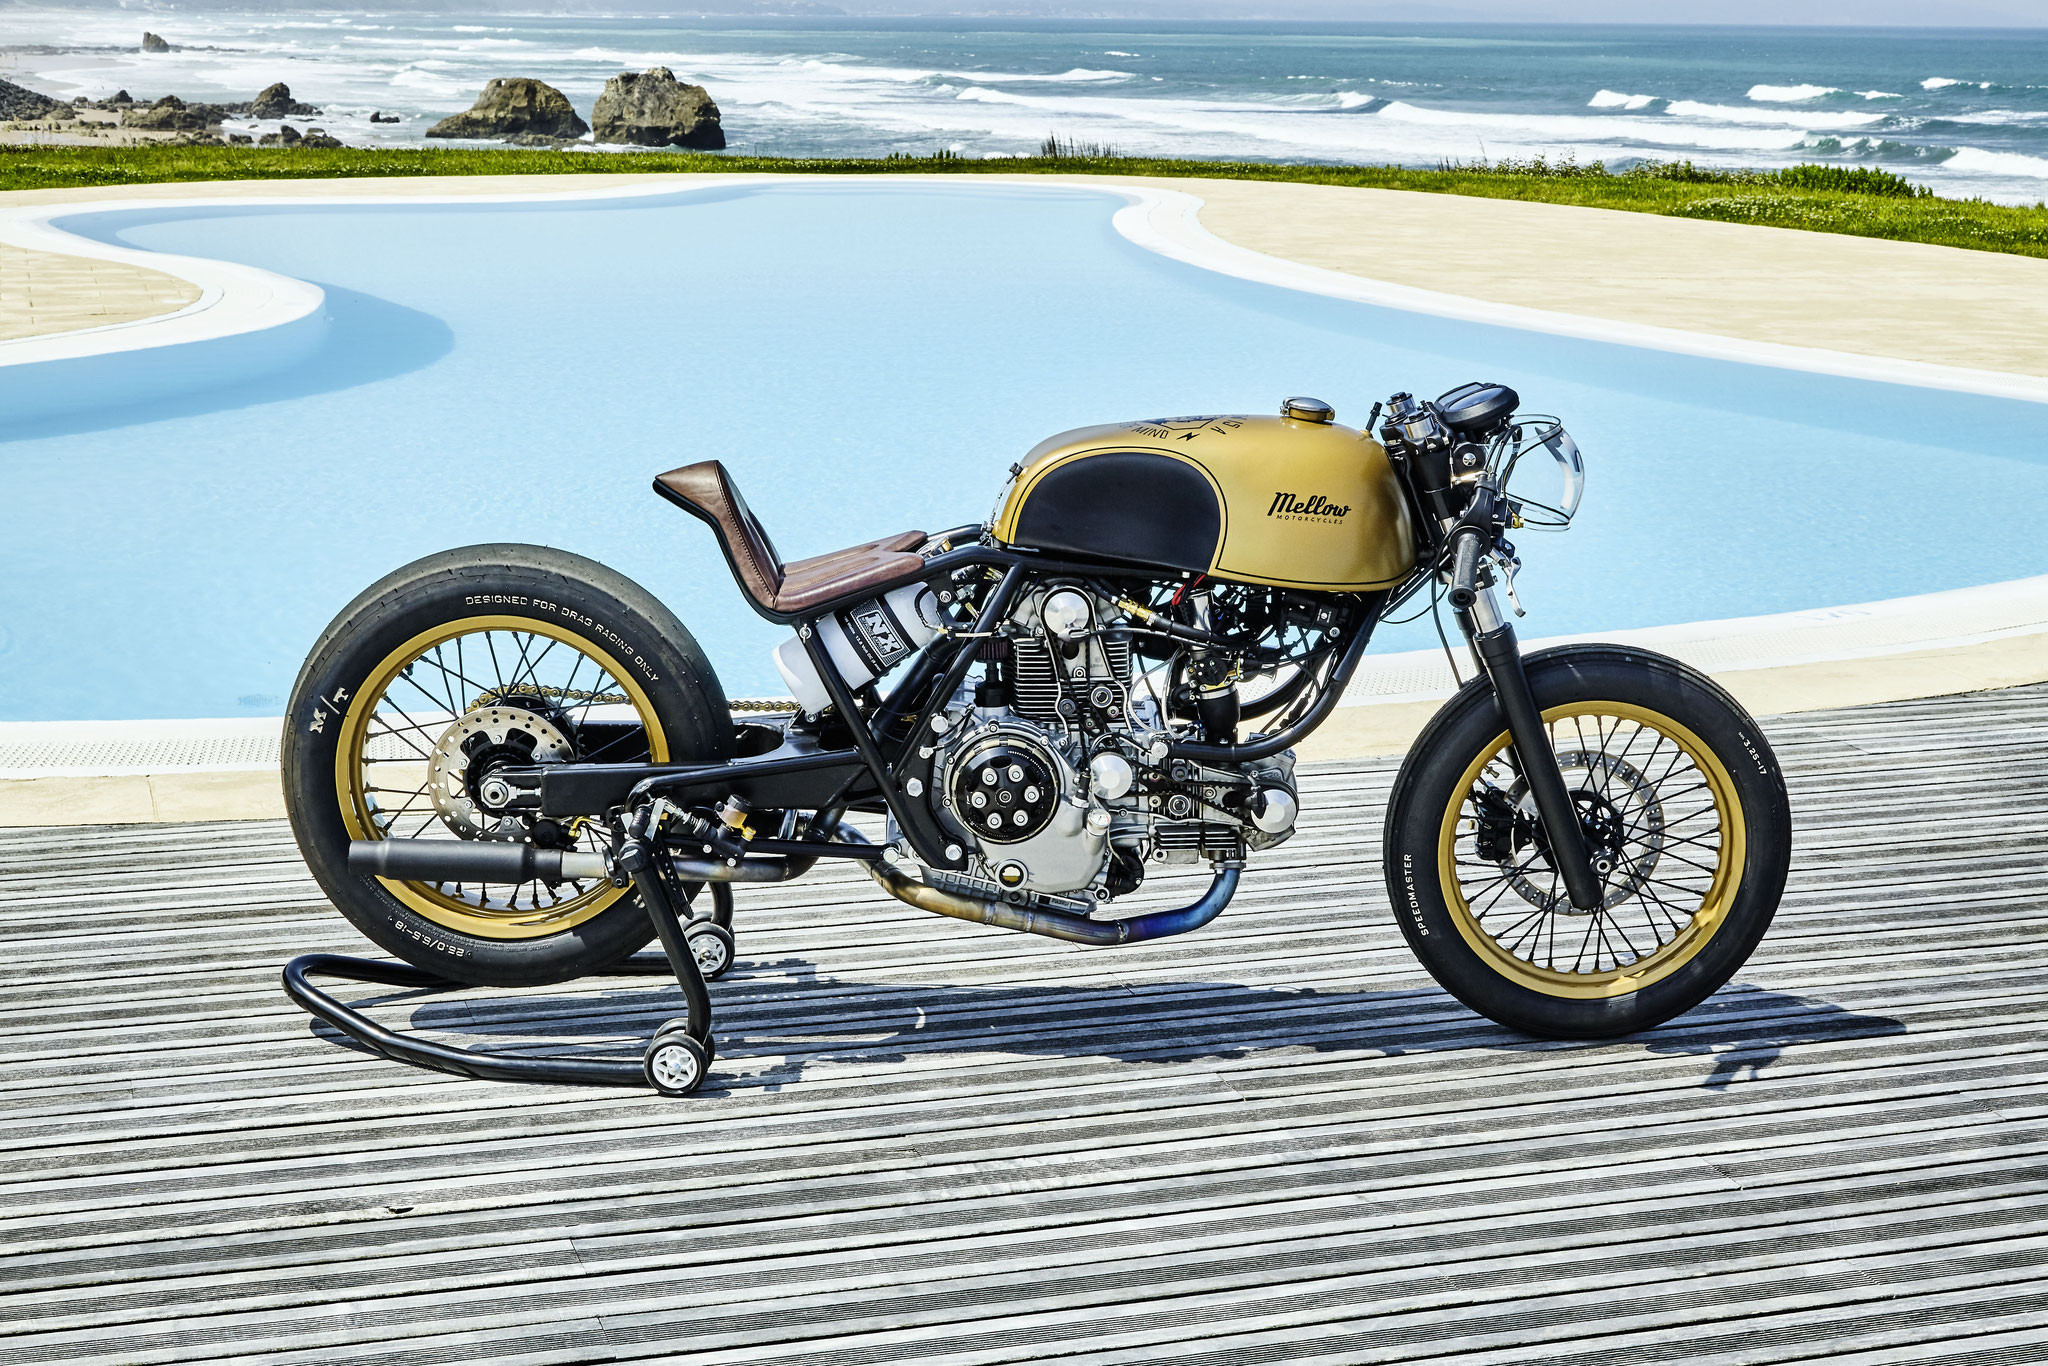 Mellow Motorcycles FRKNSTN Ducati 1000 Sprint Racer - NOS - Honda 750 Frame - KTM Swingarm